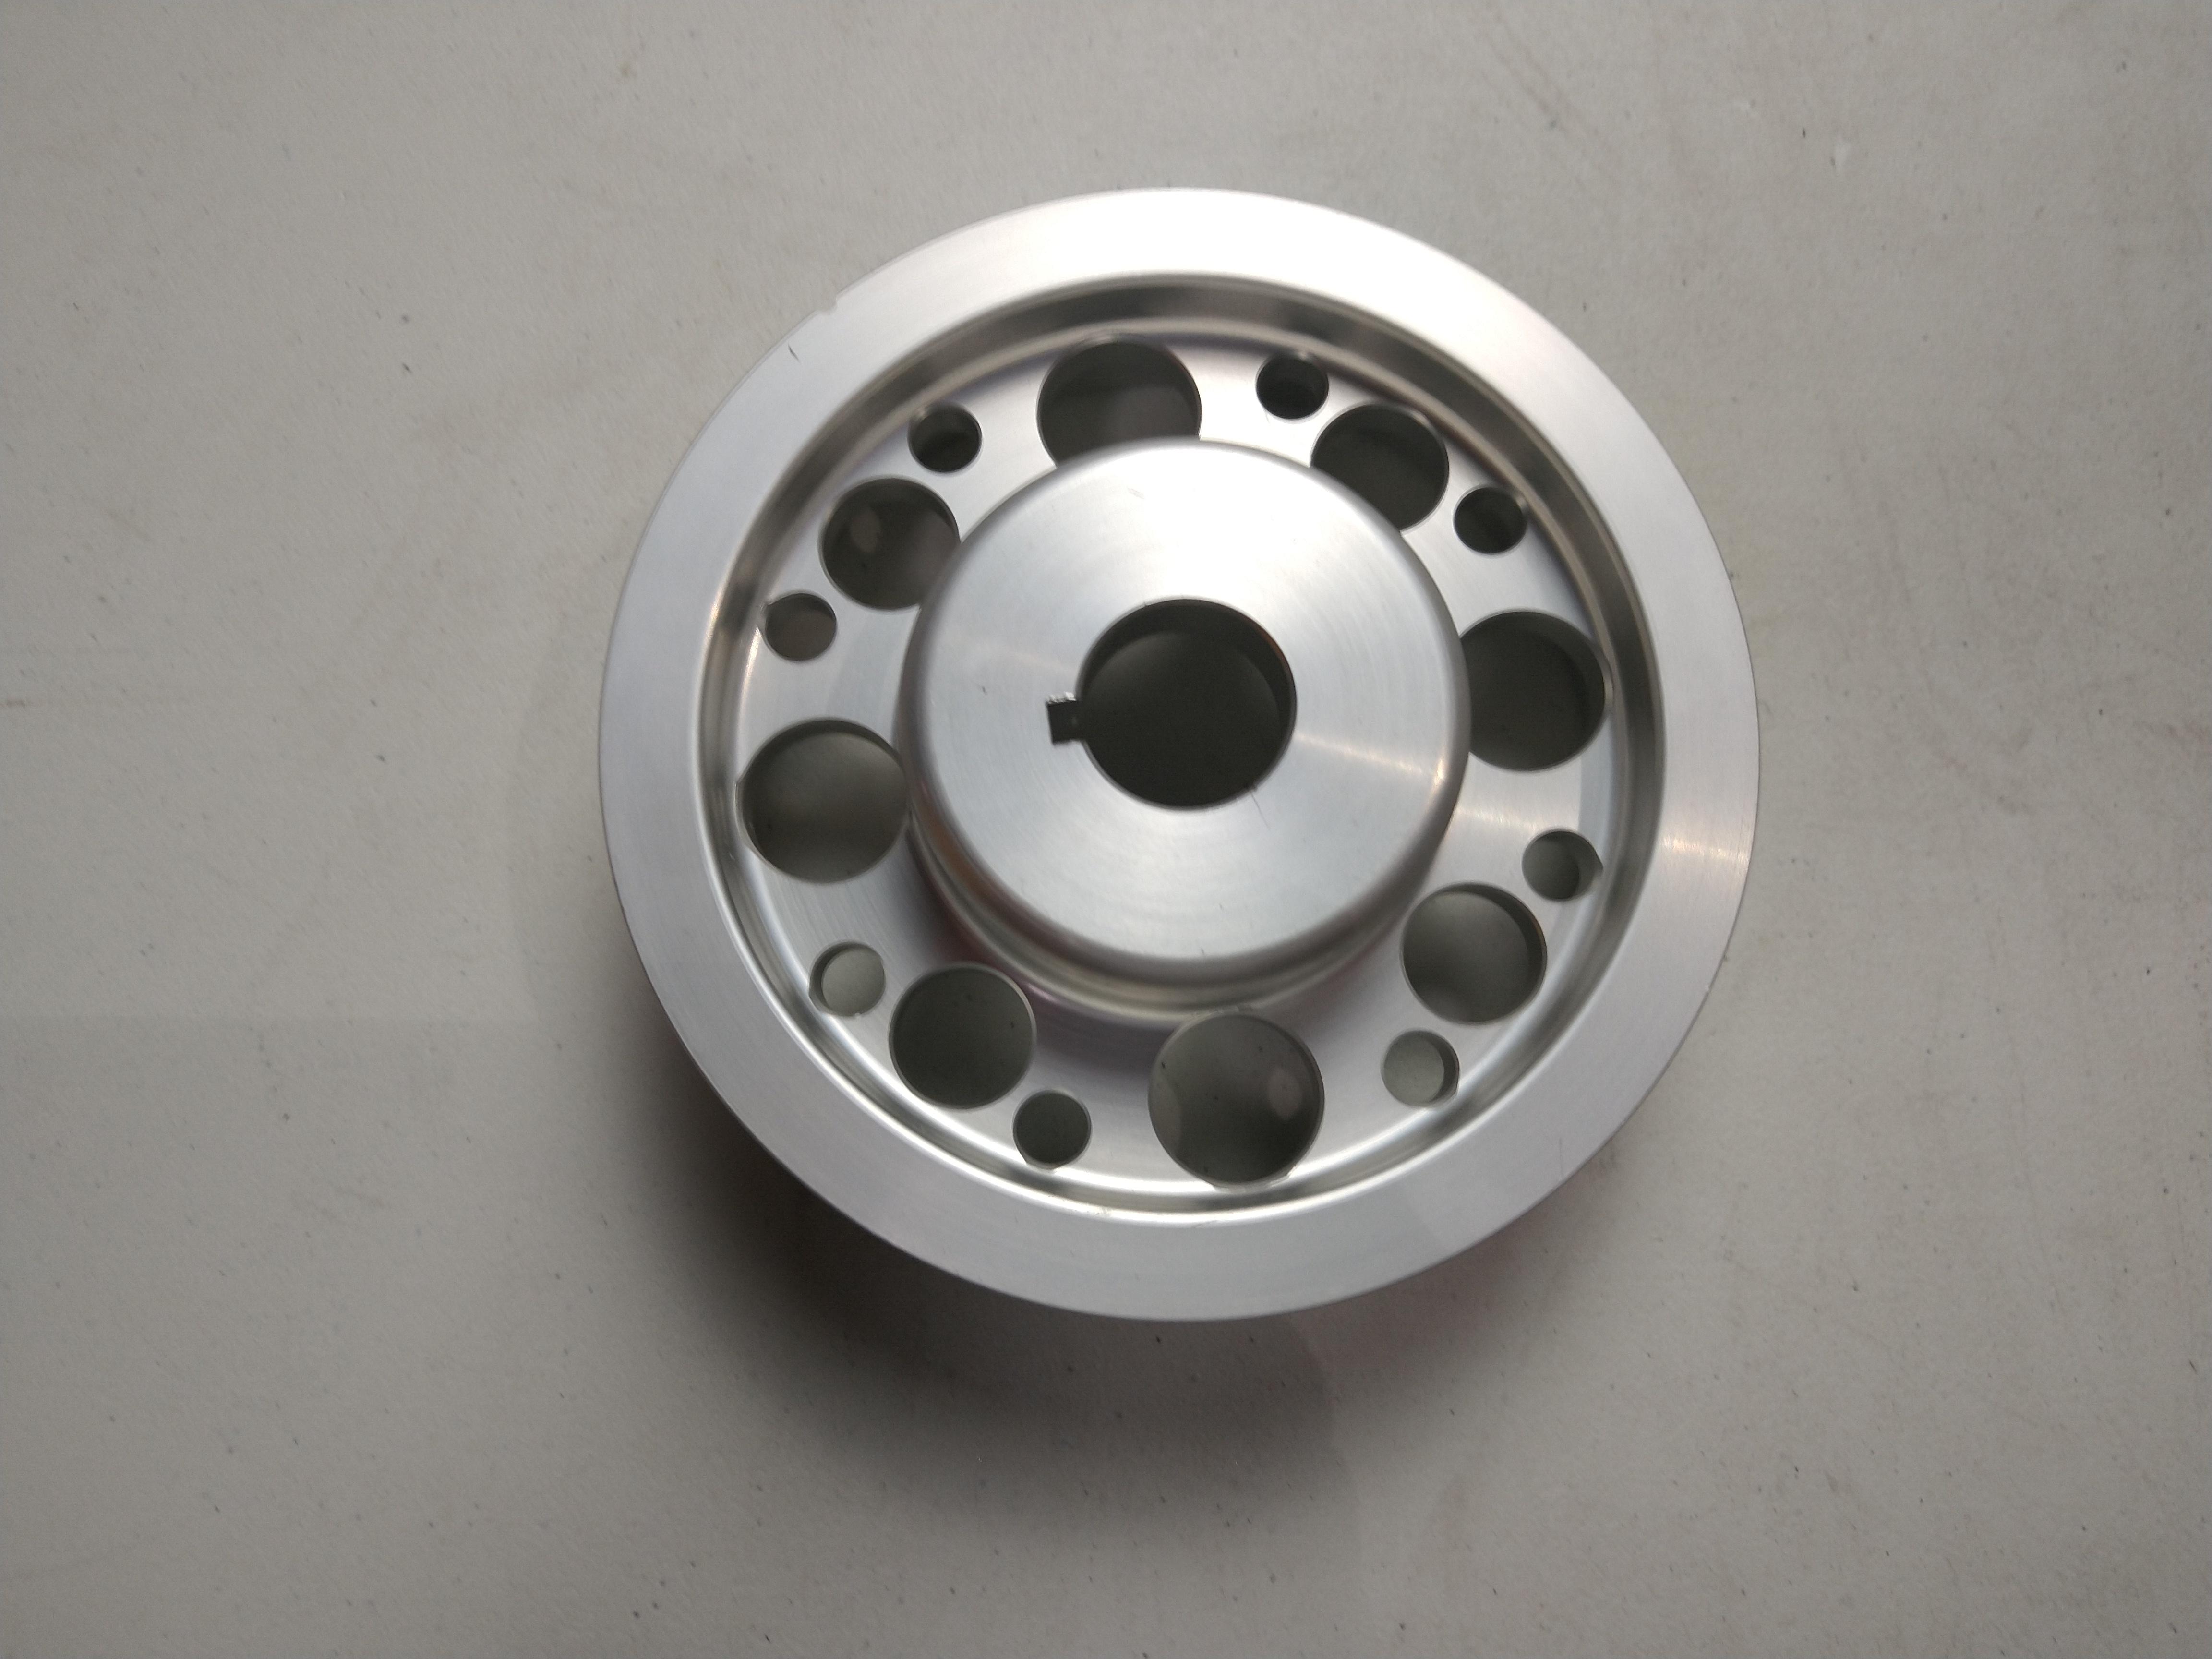 Agency Power Lightweight Silver Crank Pulley Subaru WRX/STI 02-07 CLEARANCE - 392988683488